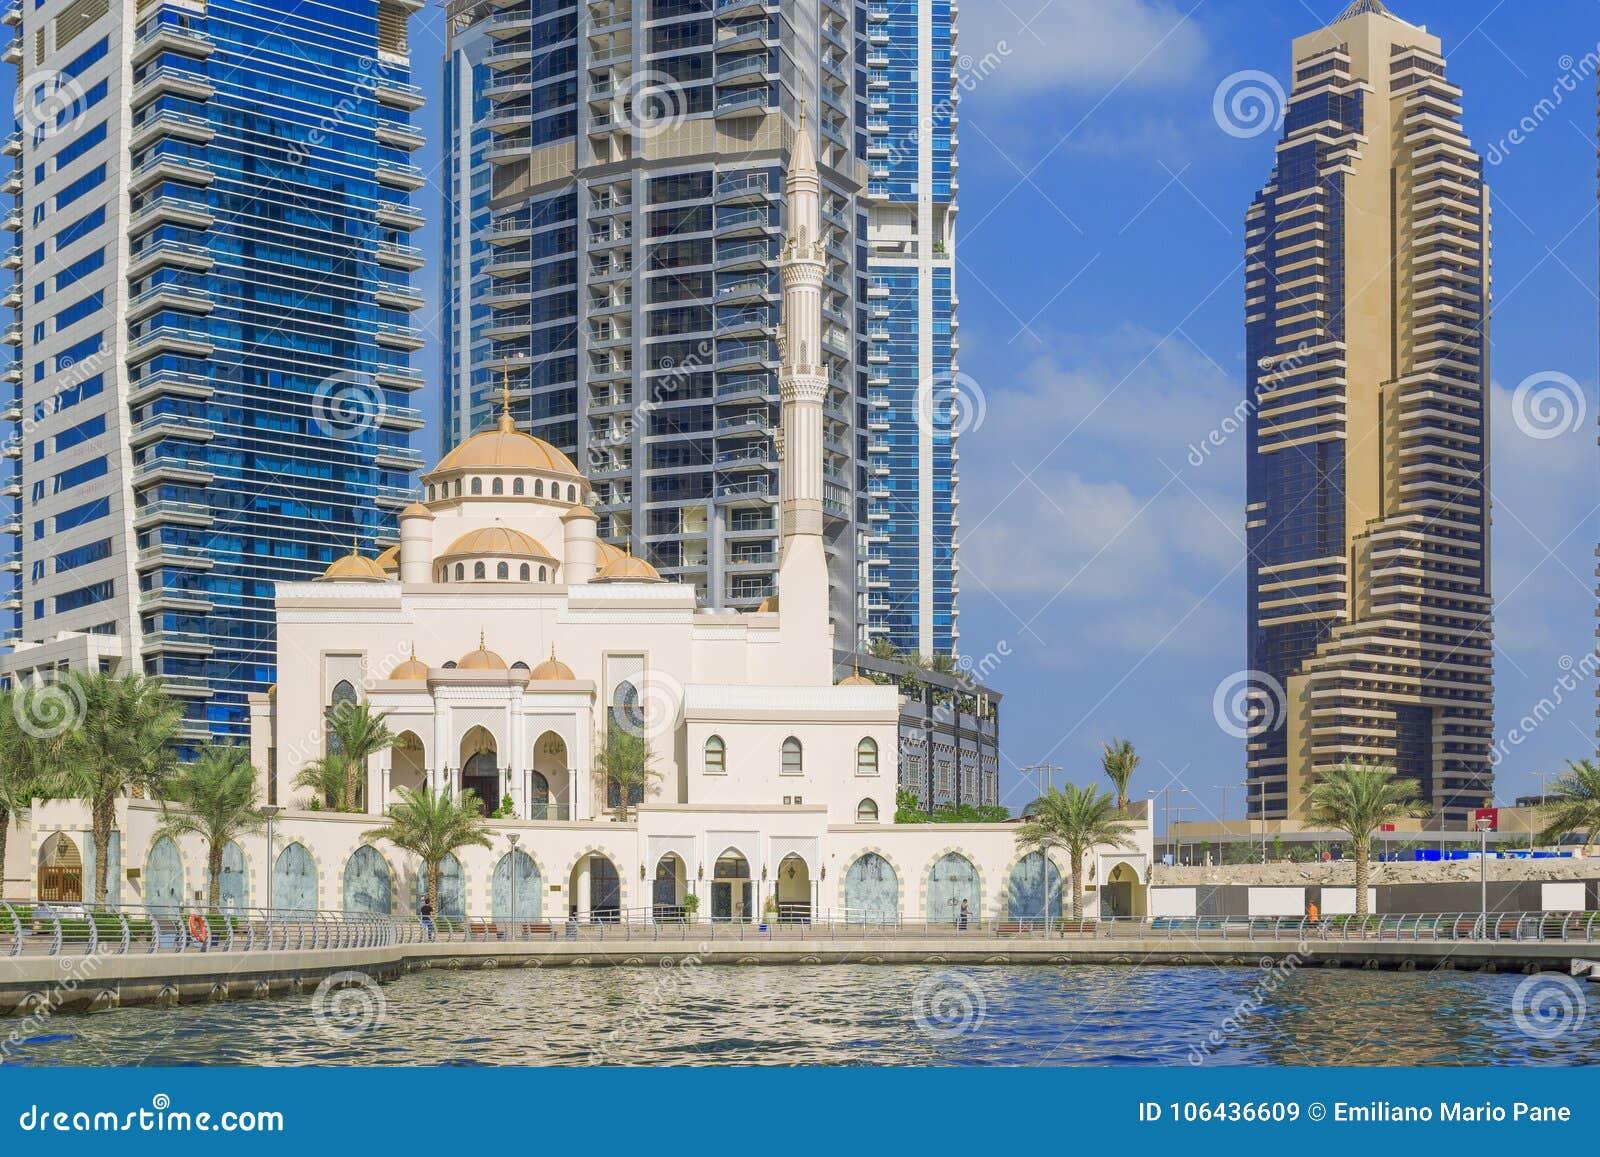 Dubai Marina Mosque Stock Image Image Of Middle